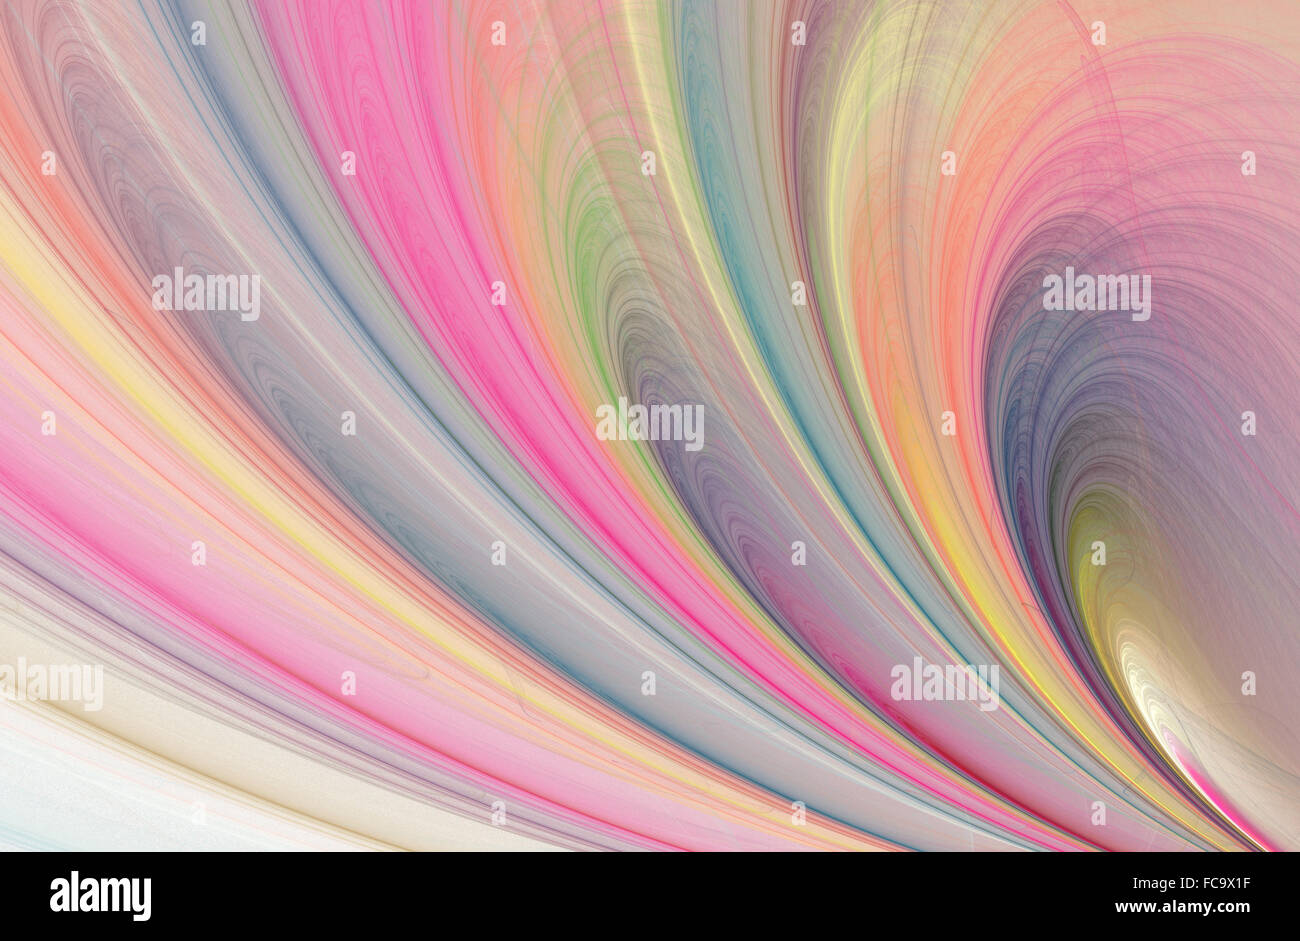 fractal - Stock Image